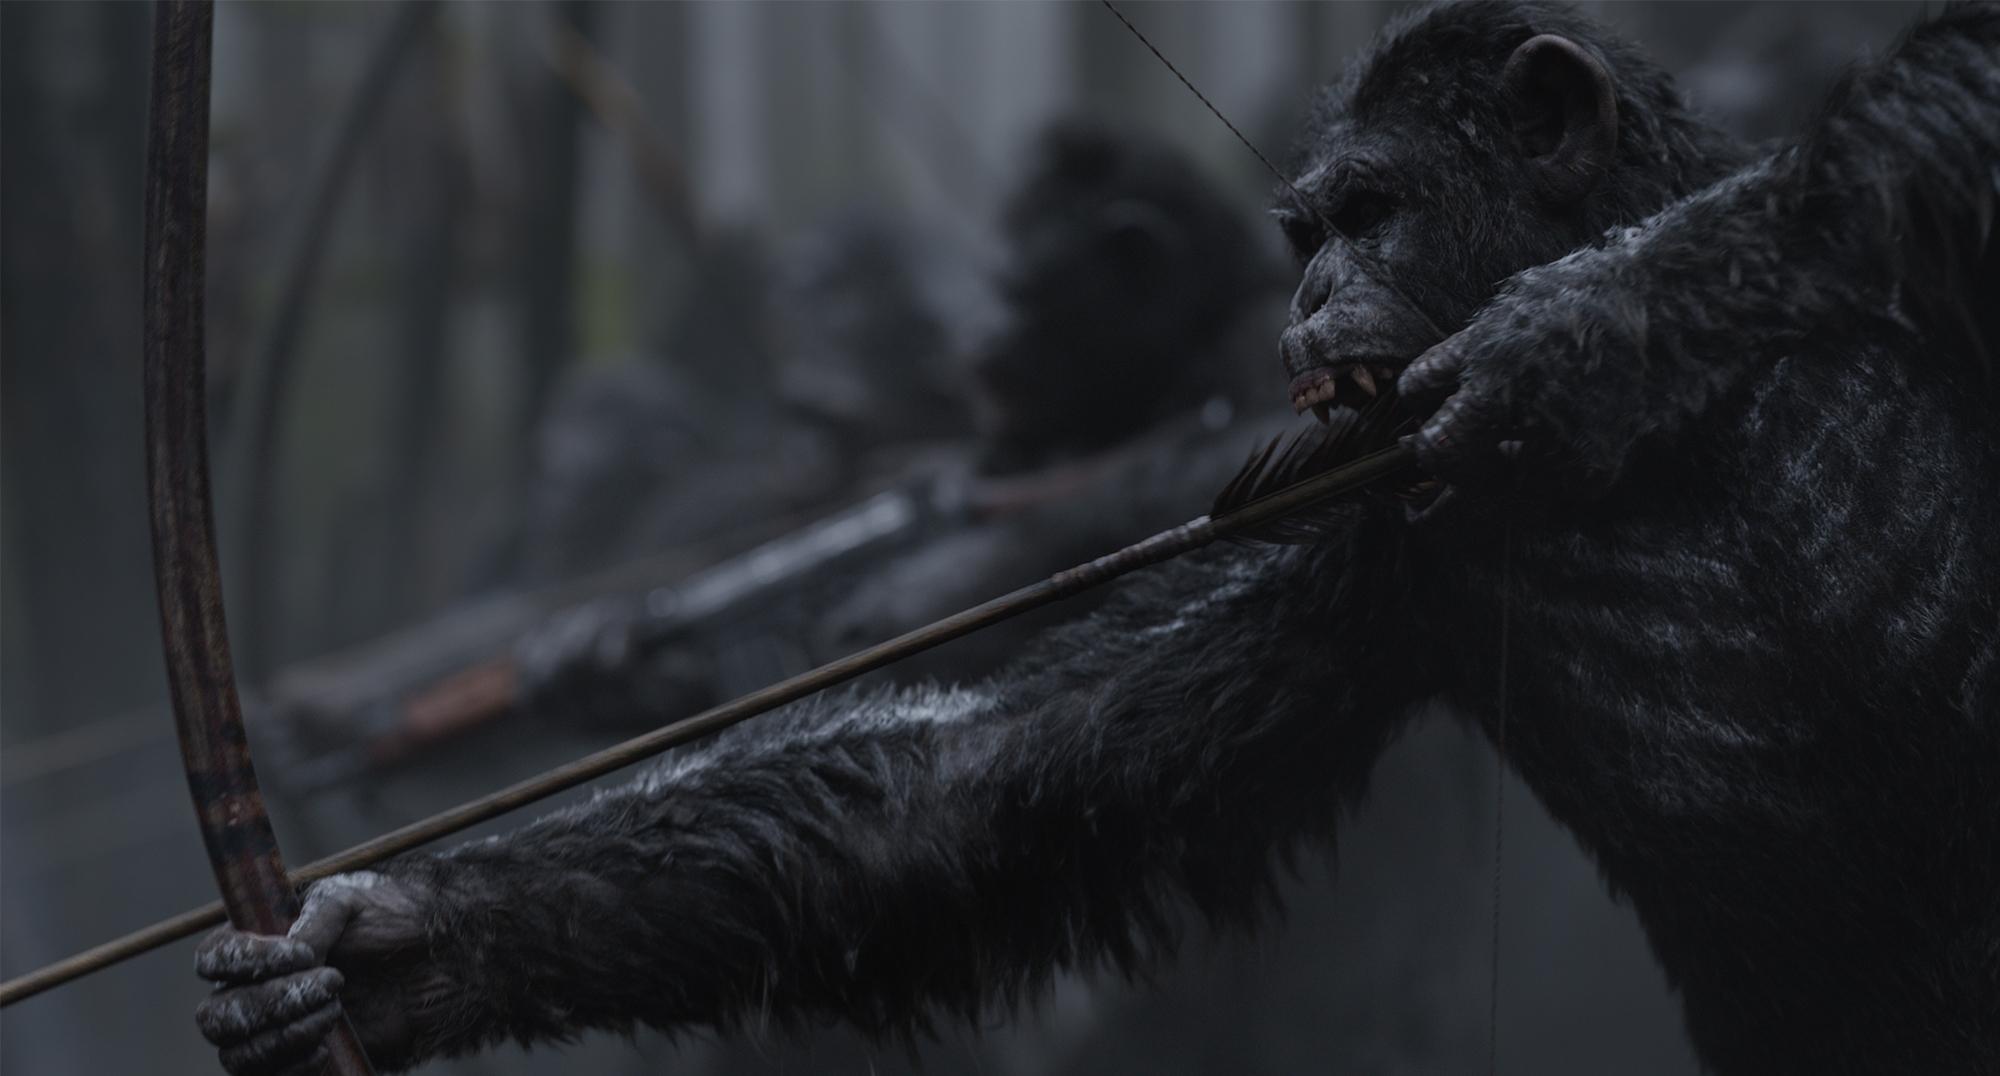 War for the Planet of the Apes - A majmok bolygója: Háború (2017) 1.kép